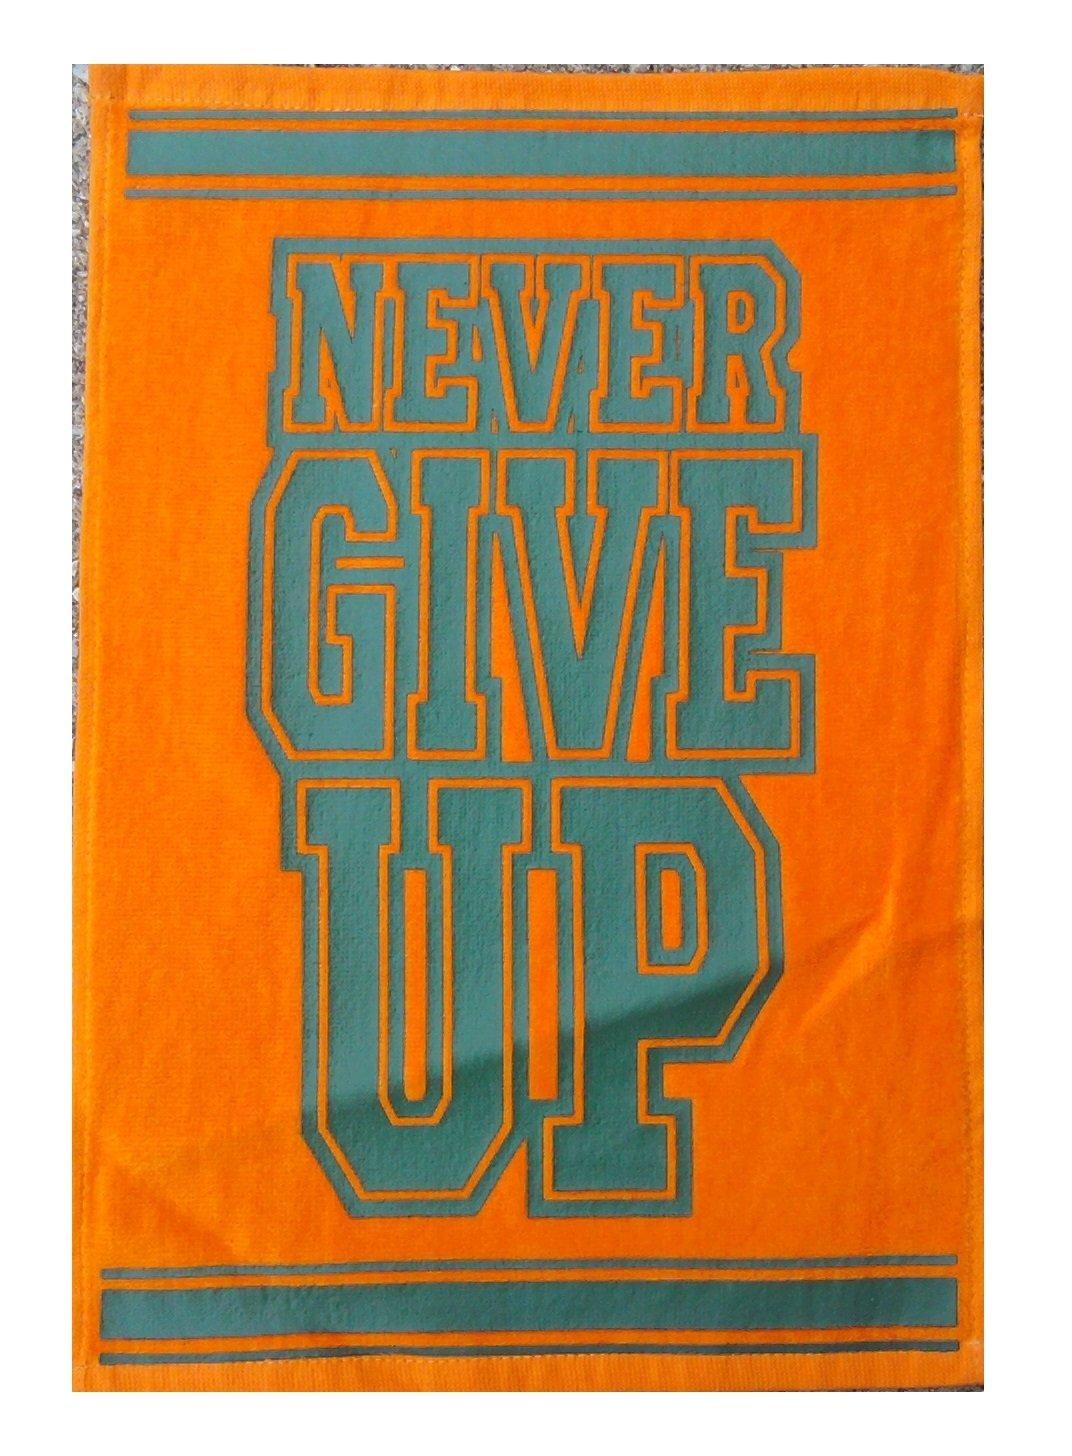 John Cena 'Never Give Up' Orange WWE Authentic Ring Entrance Towel